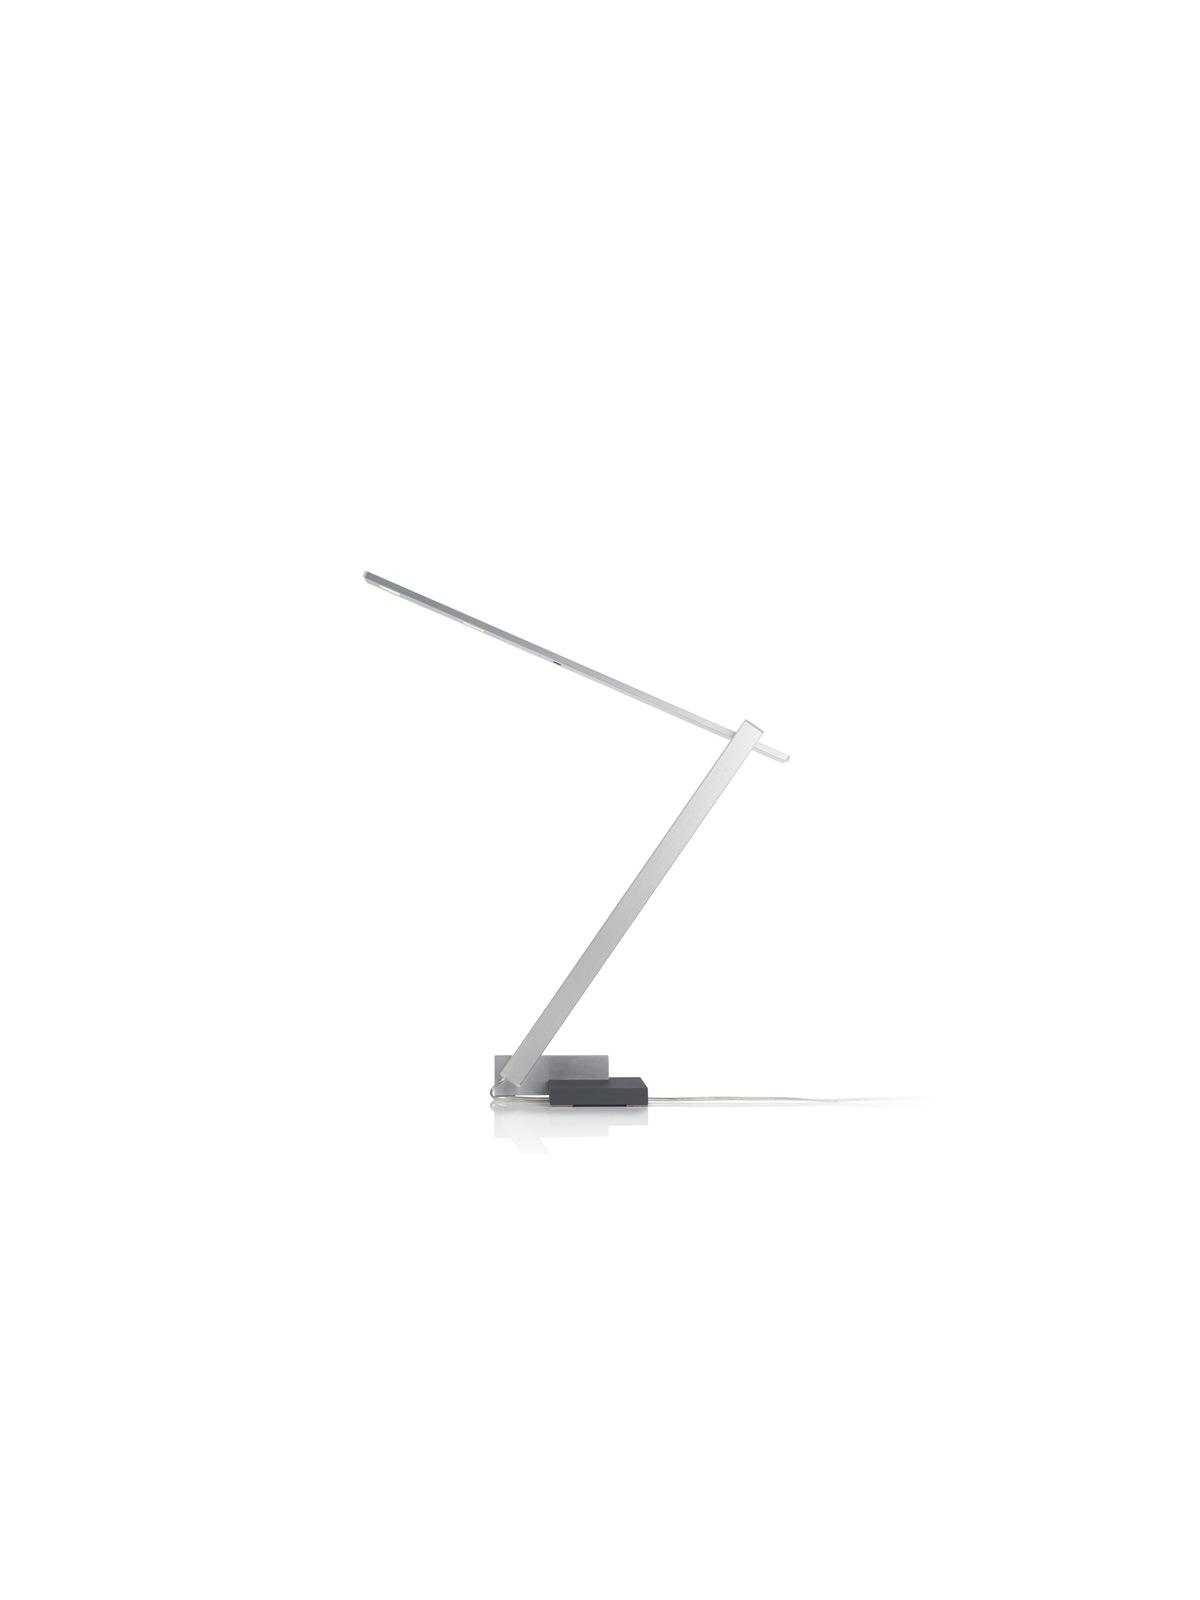 BYOK Nastrino Pico LED Leuchte DesignOrt Onlineshop Lampen Berlin